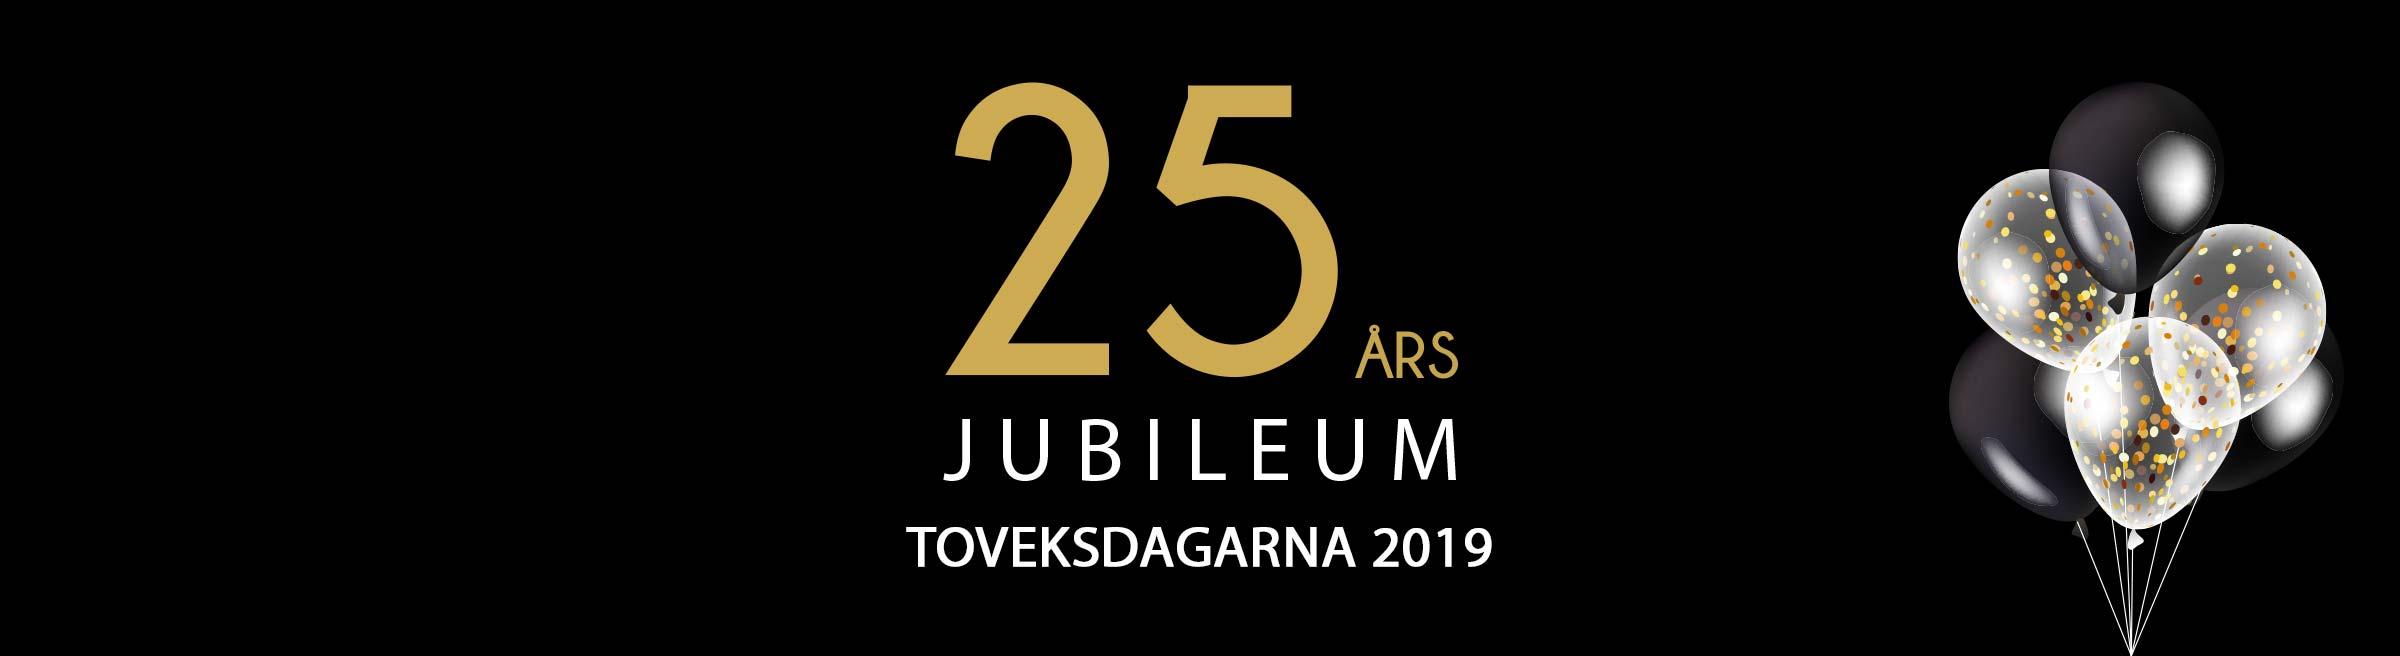 25-års jubileum Toveks Bil